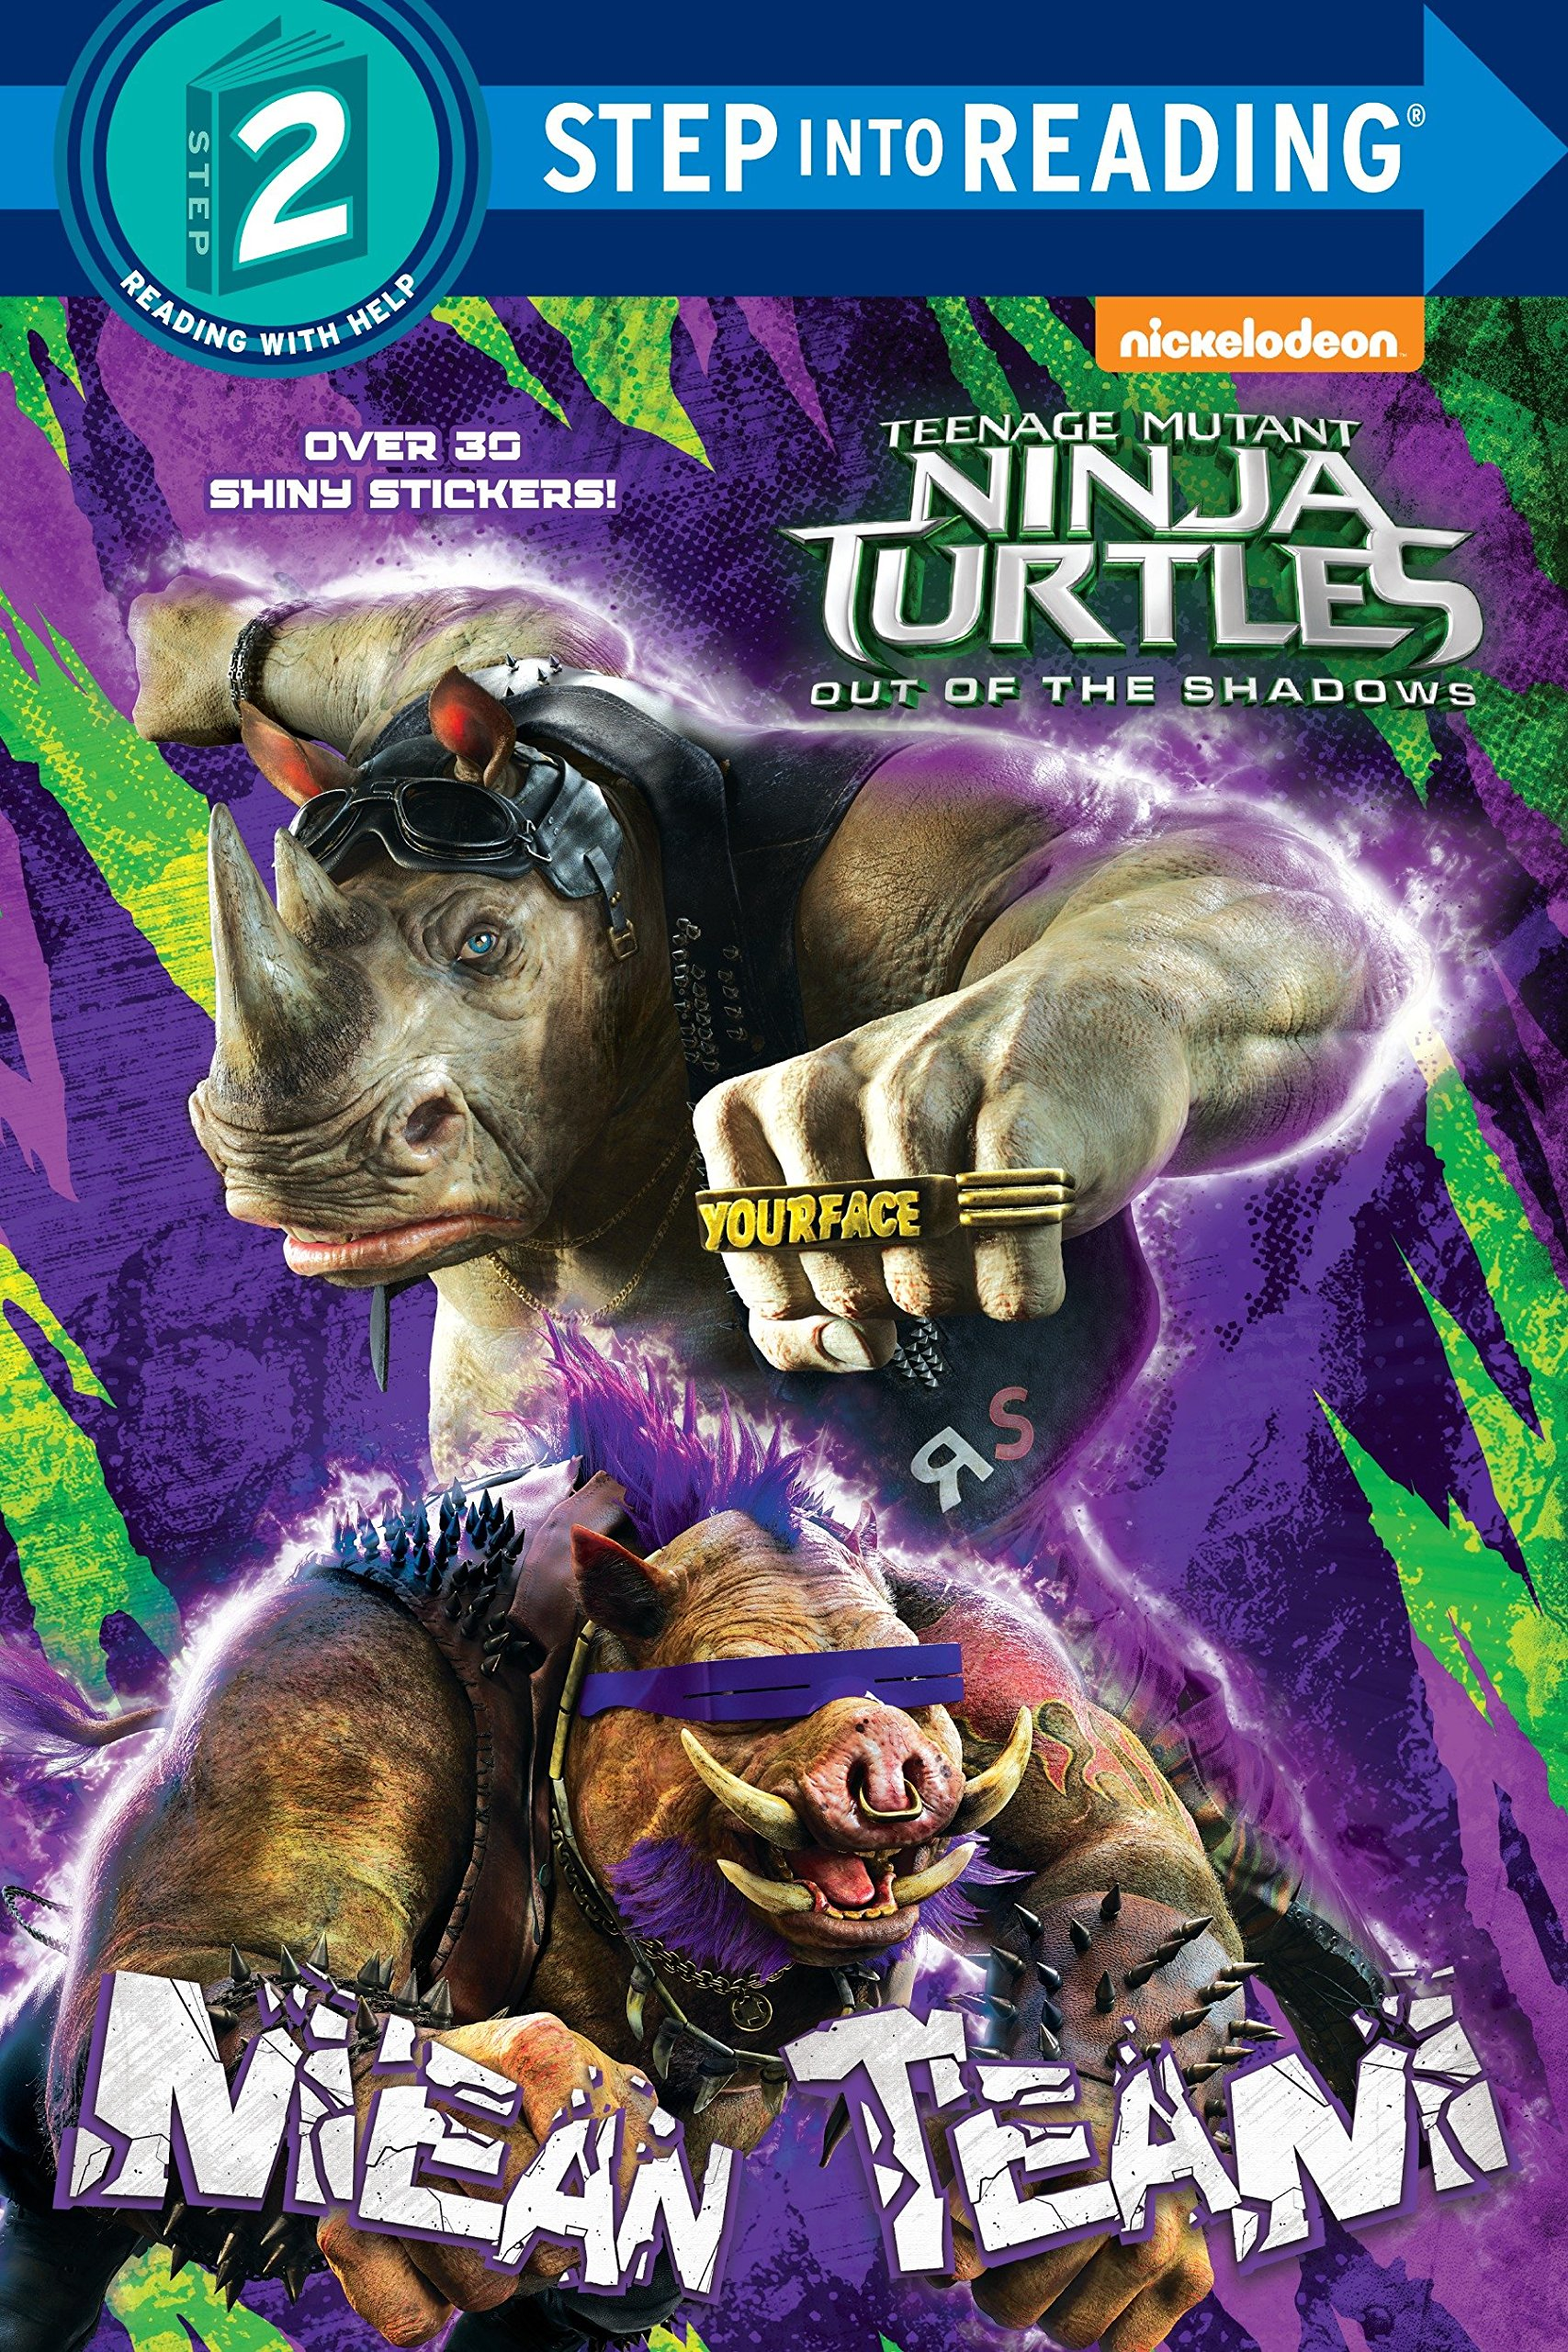 Amazon Com Mean Team Teenage Mutant Ninja Turtles Out Of The Shadows Step Into Reading 9781524701734 Random House Spaziante Patrick Books